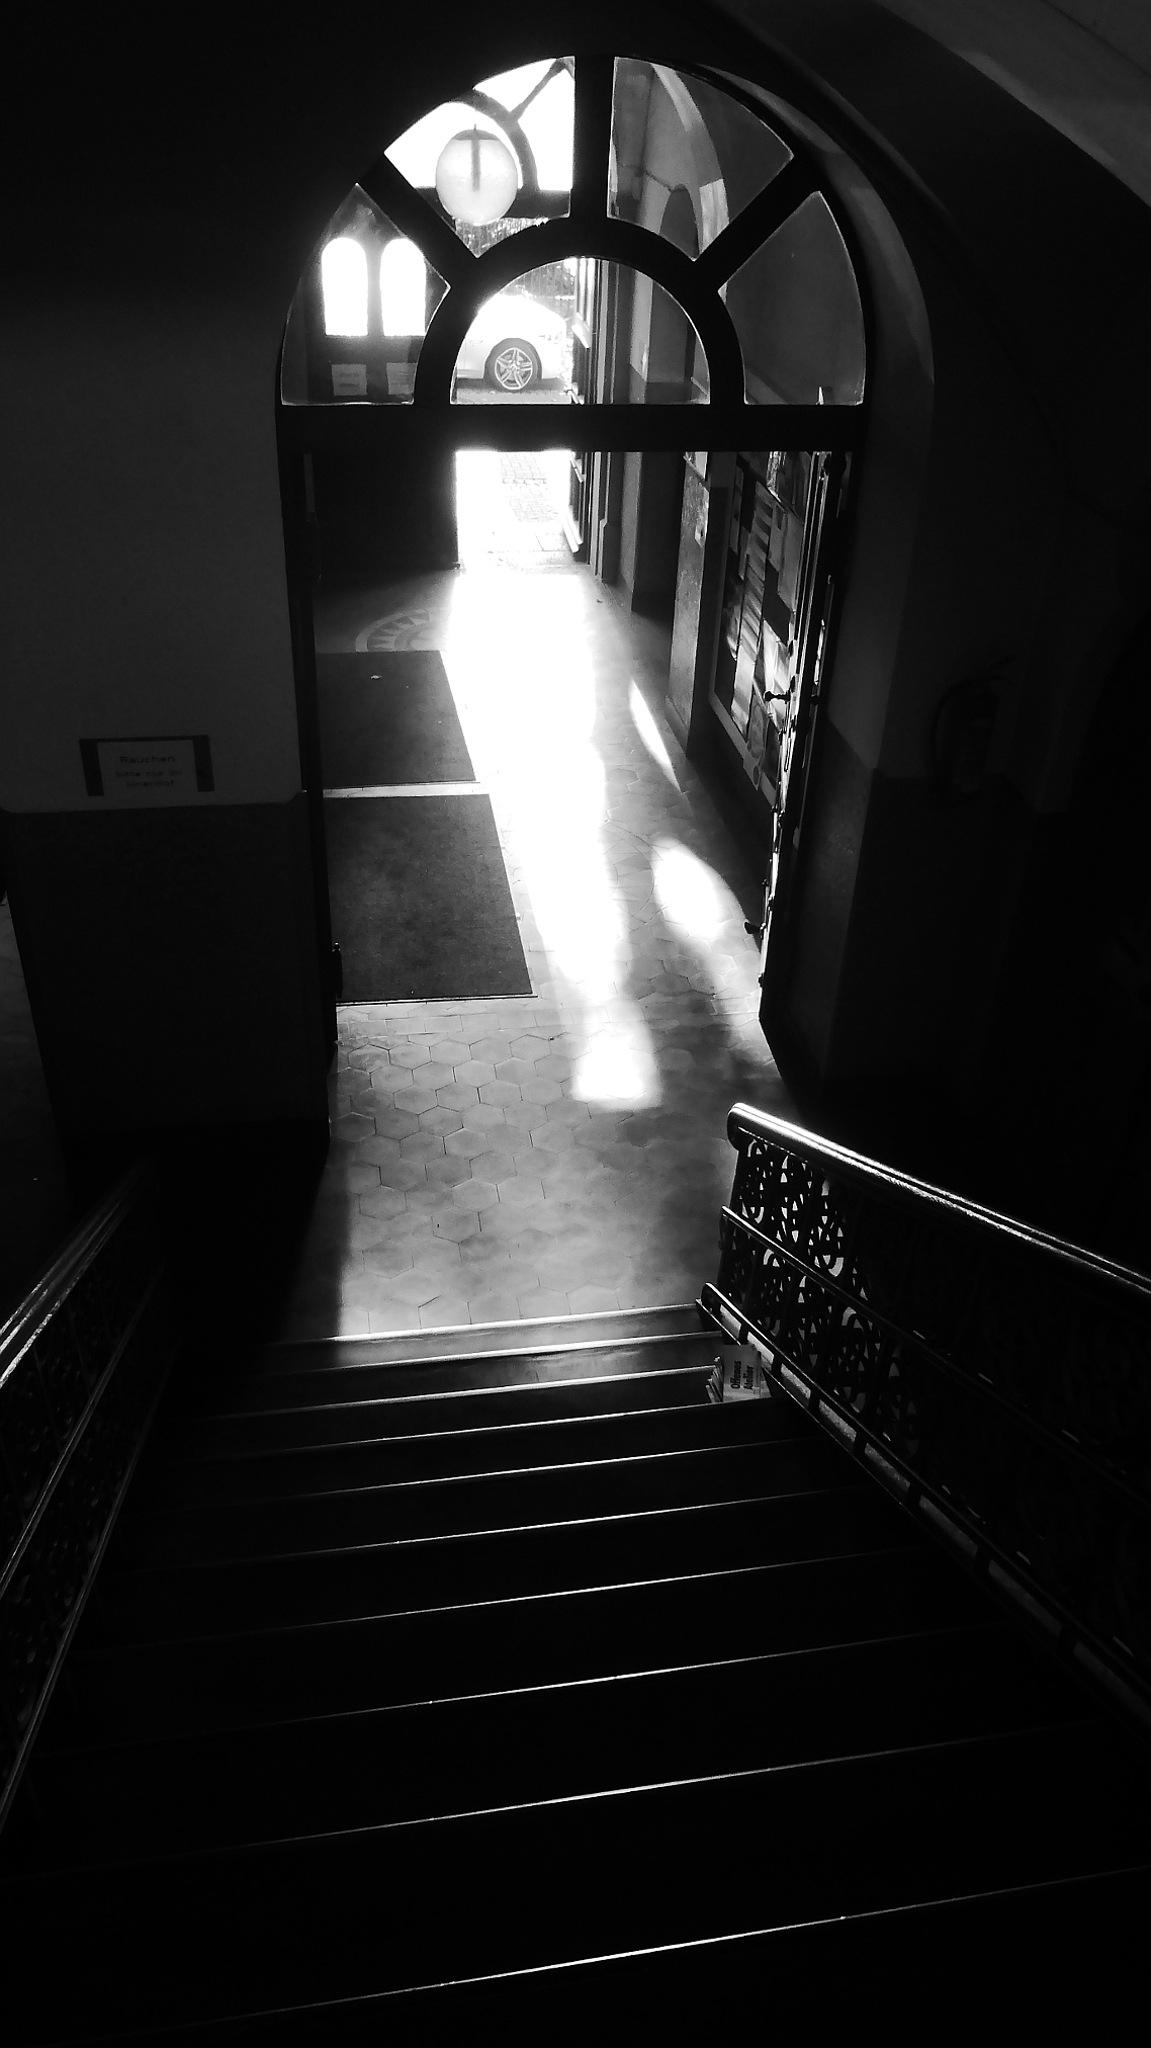 Downstairs by Gernot Schwarz